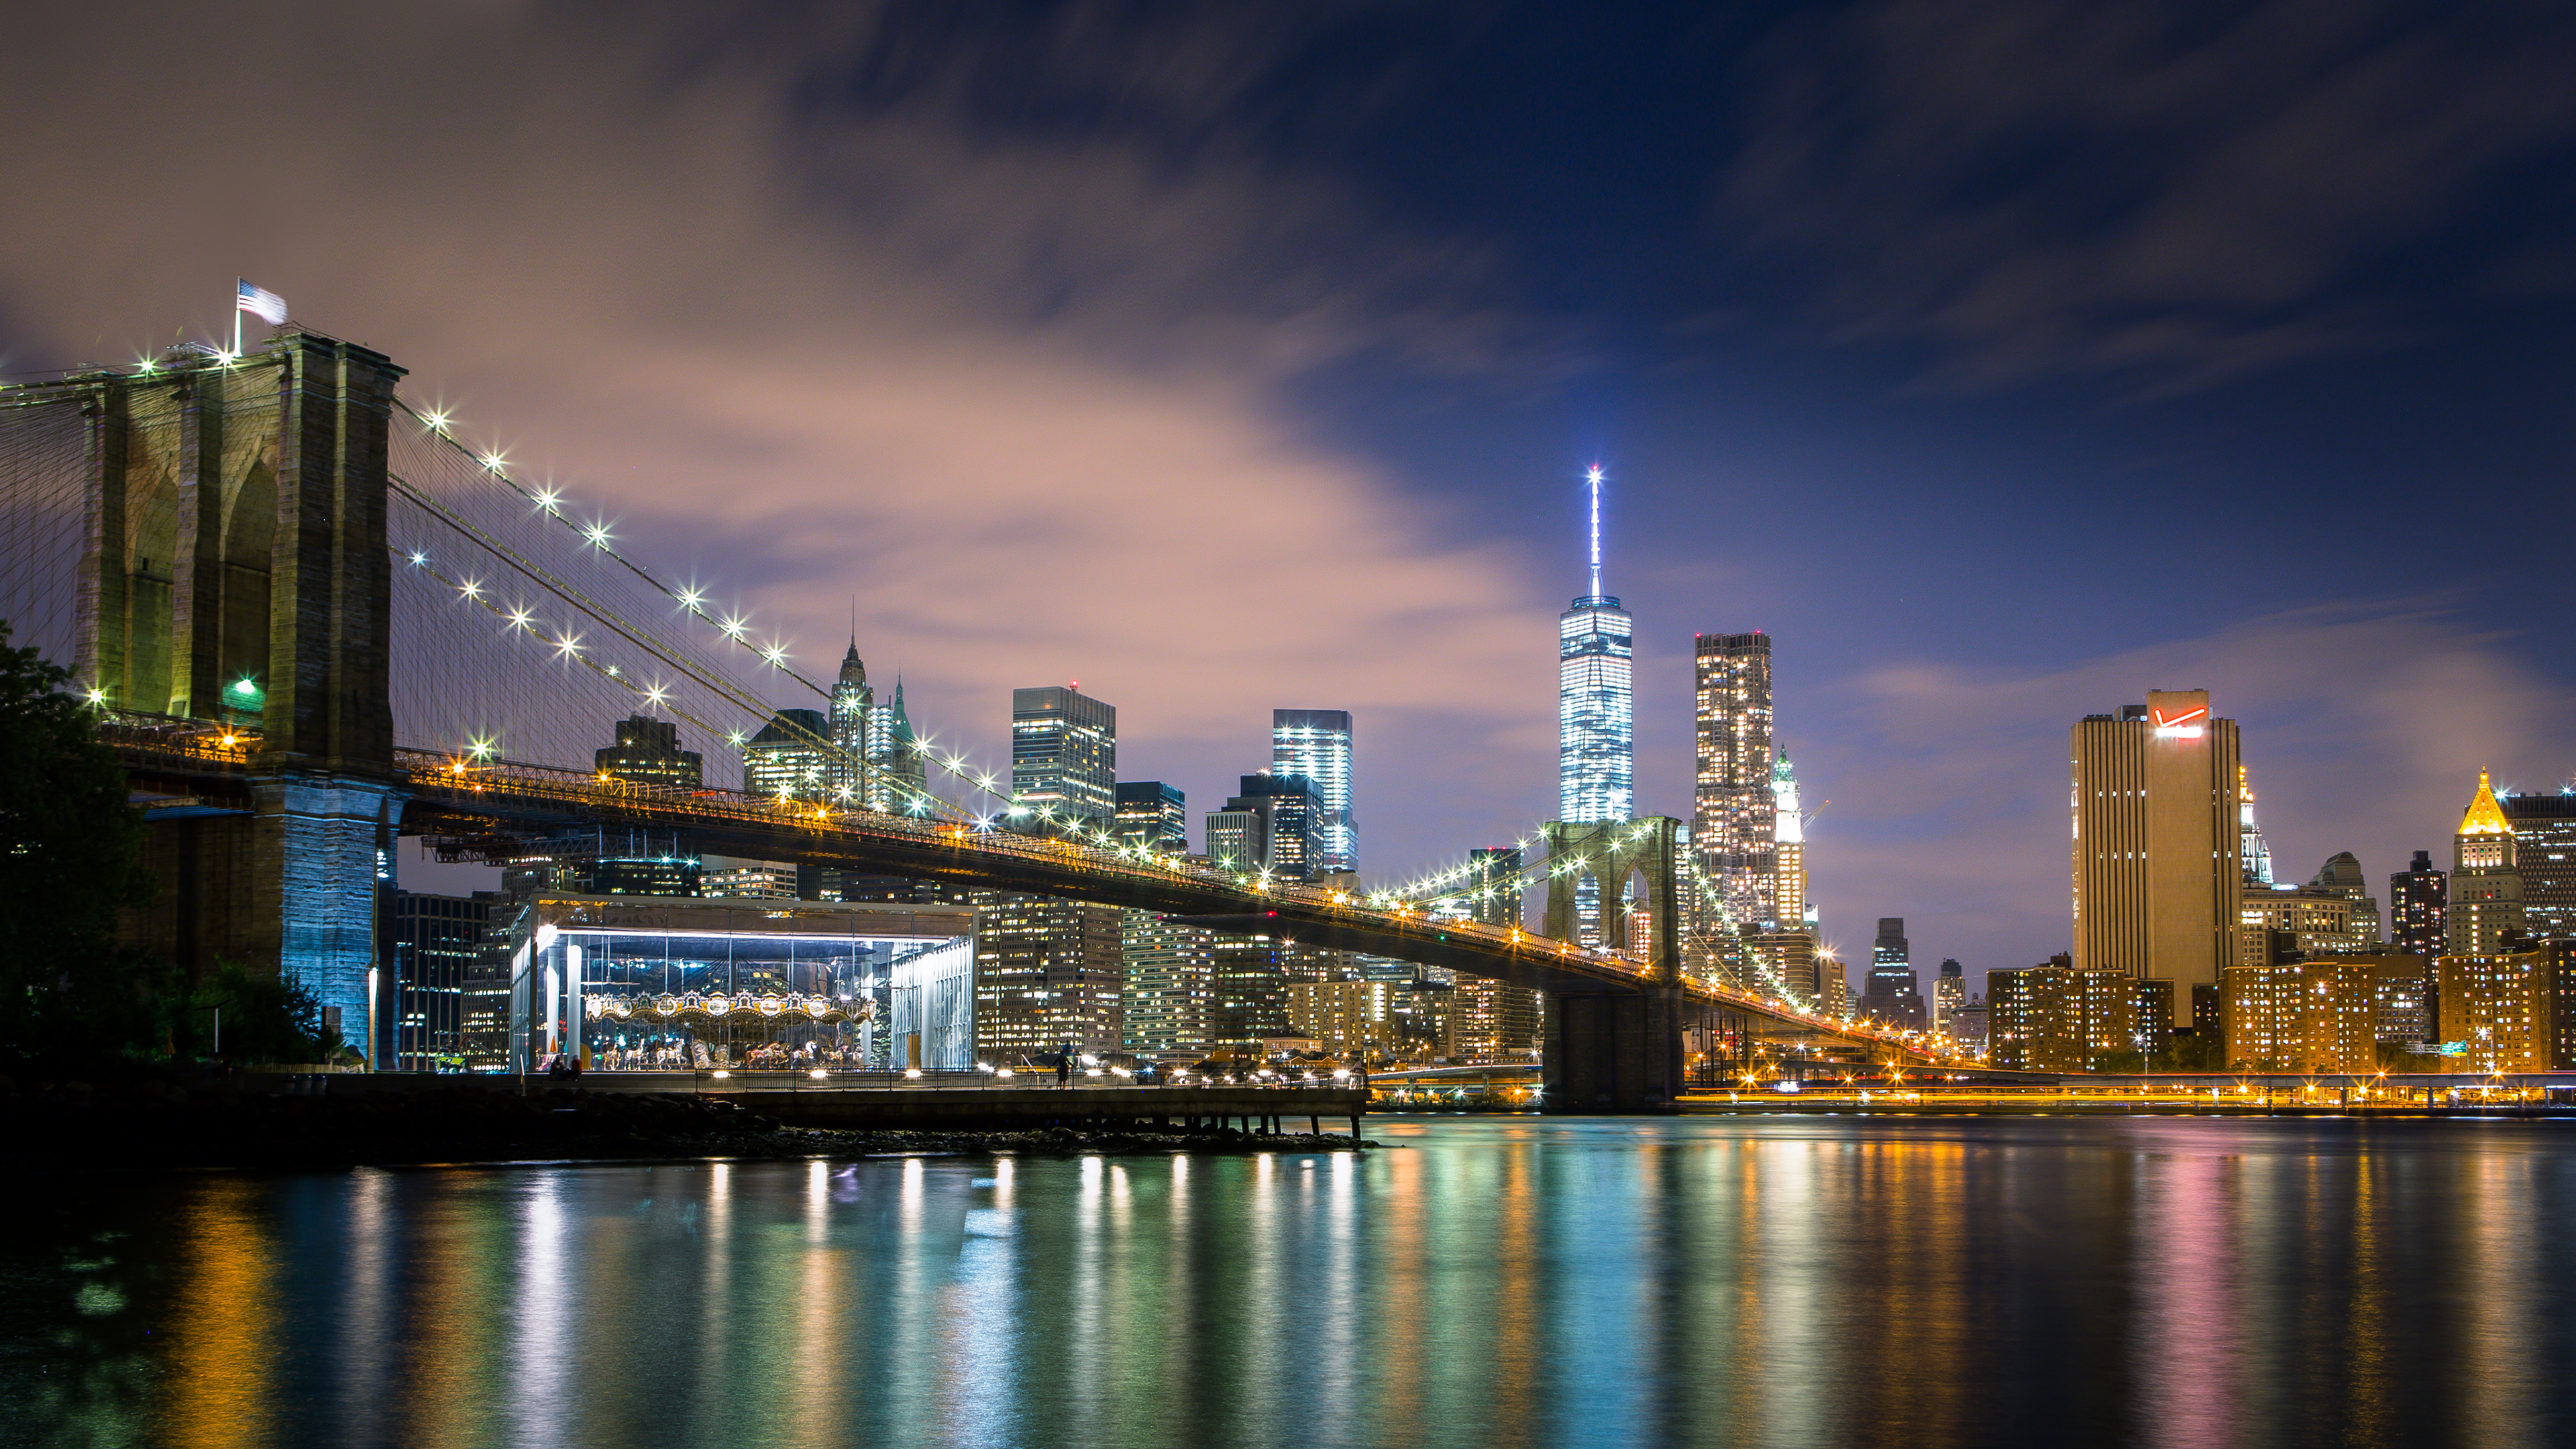 Fondos de pantalla de nueva york wallpapers new york hd for Immagini desktop new york